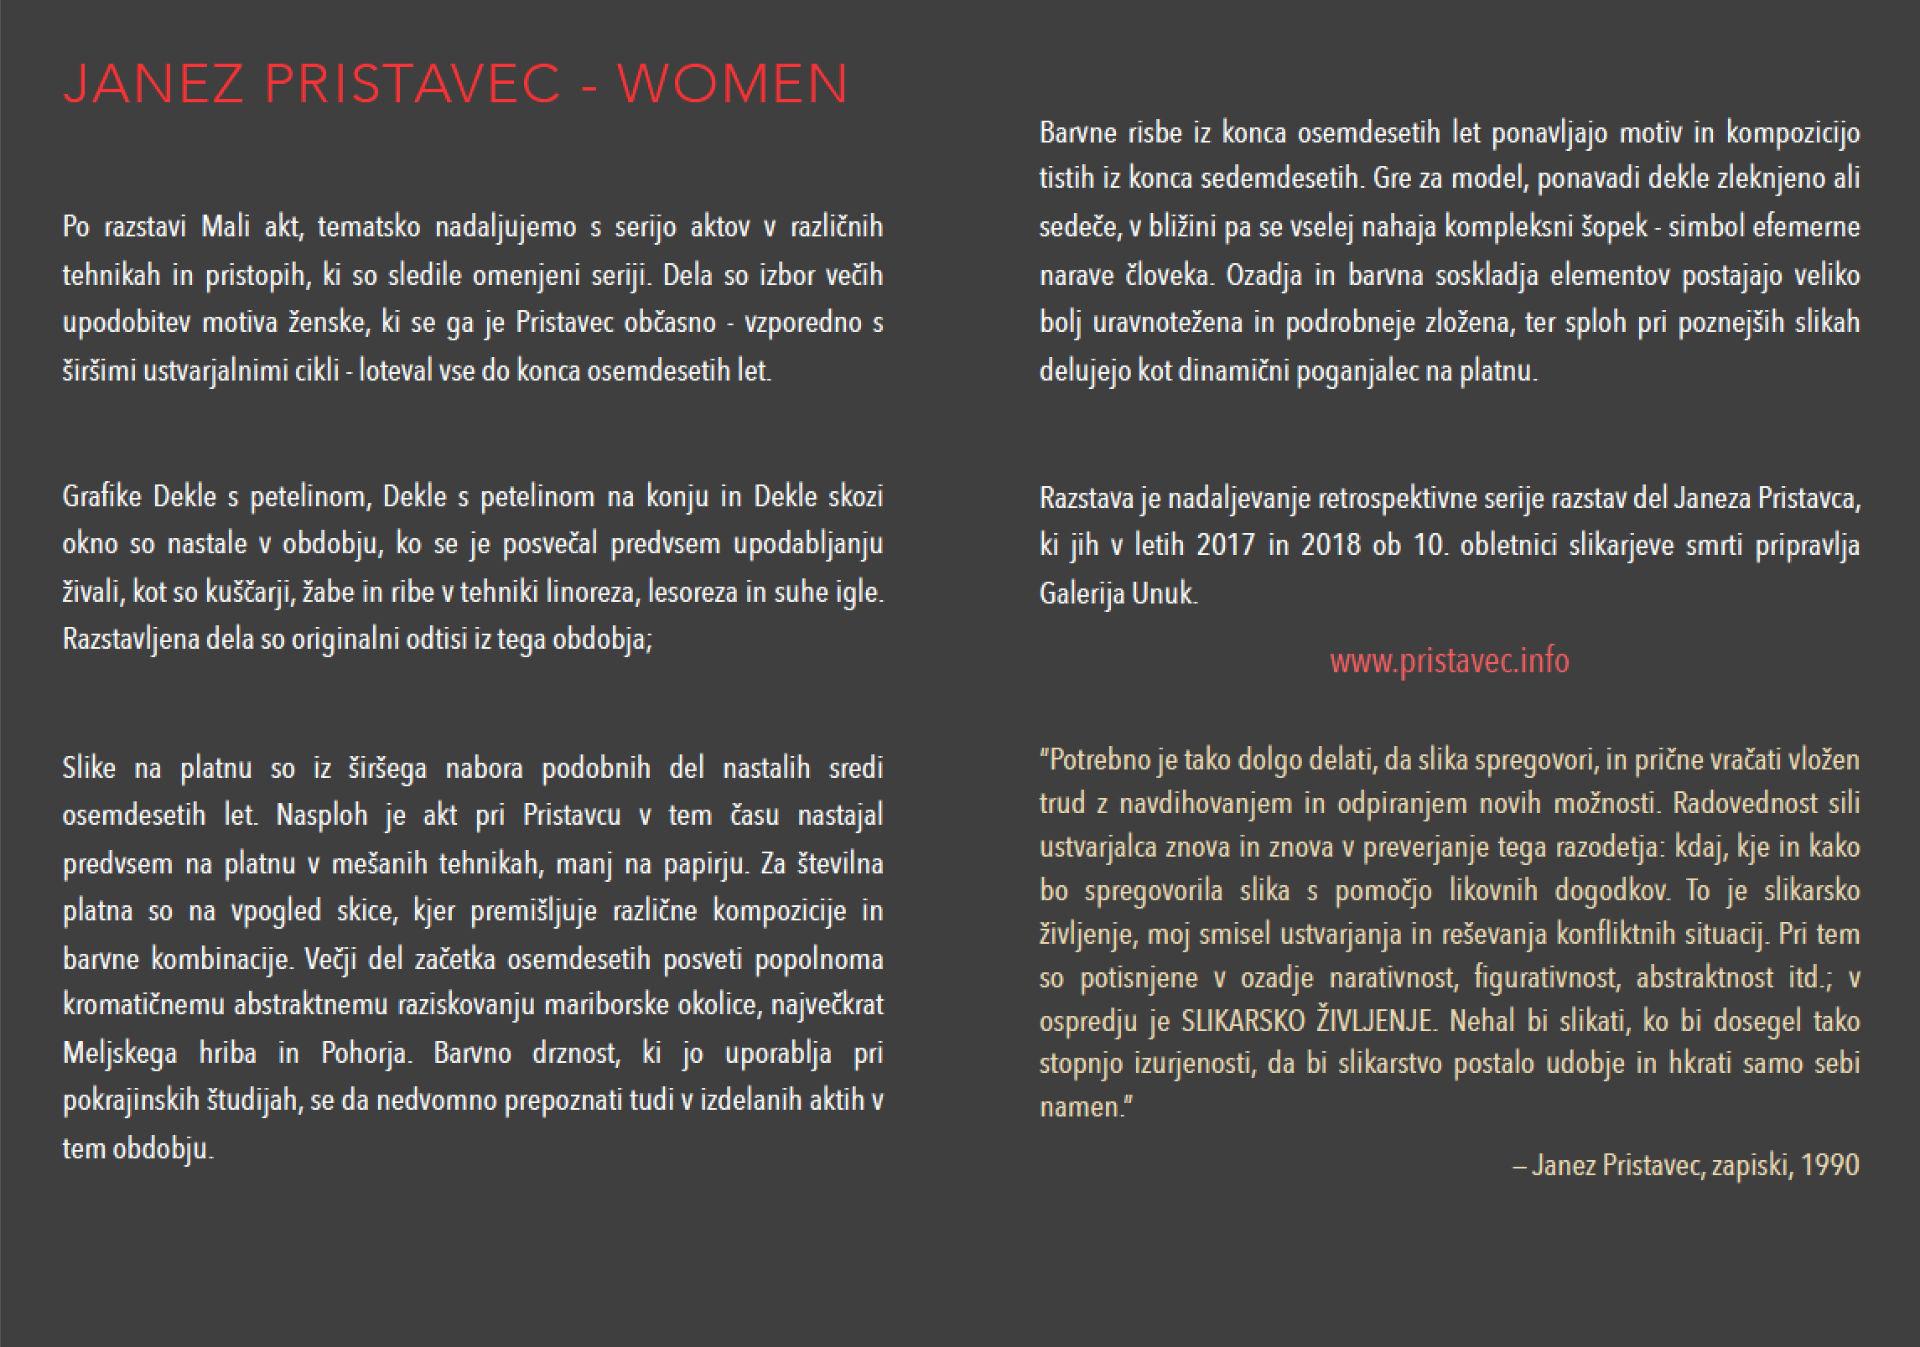 Katalog_Pristavec_Women_4.jpg